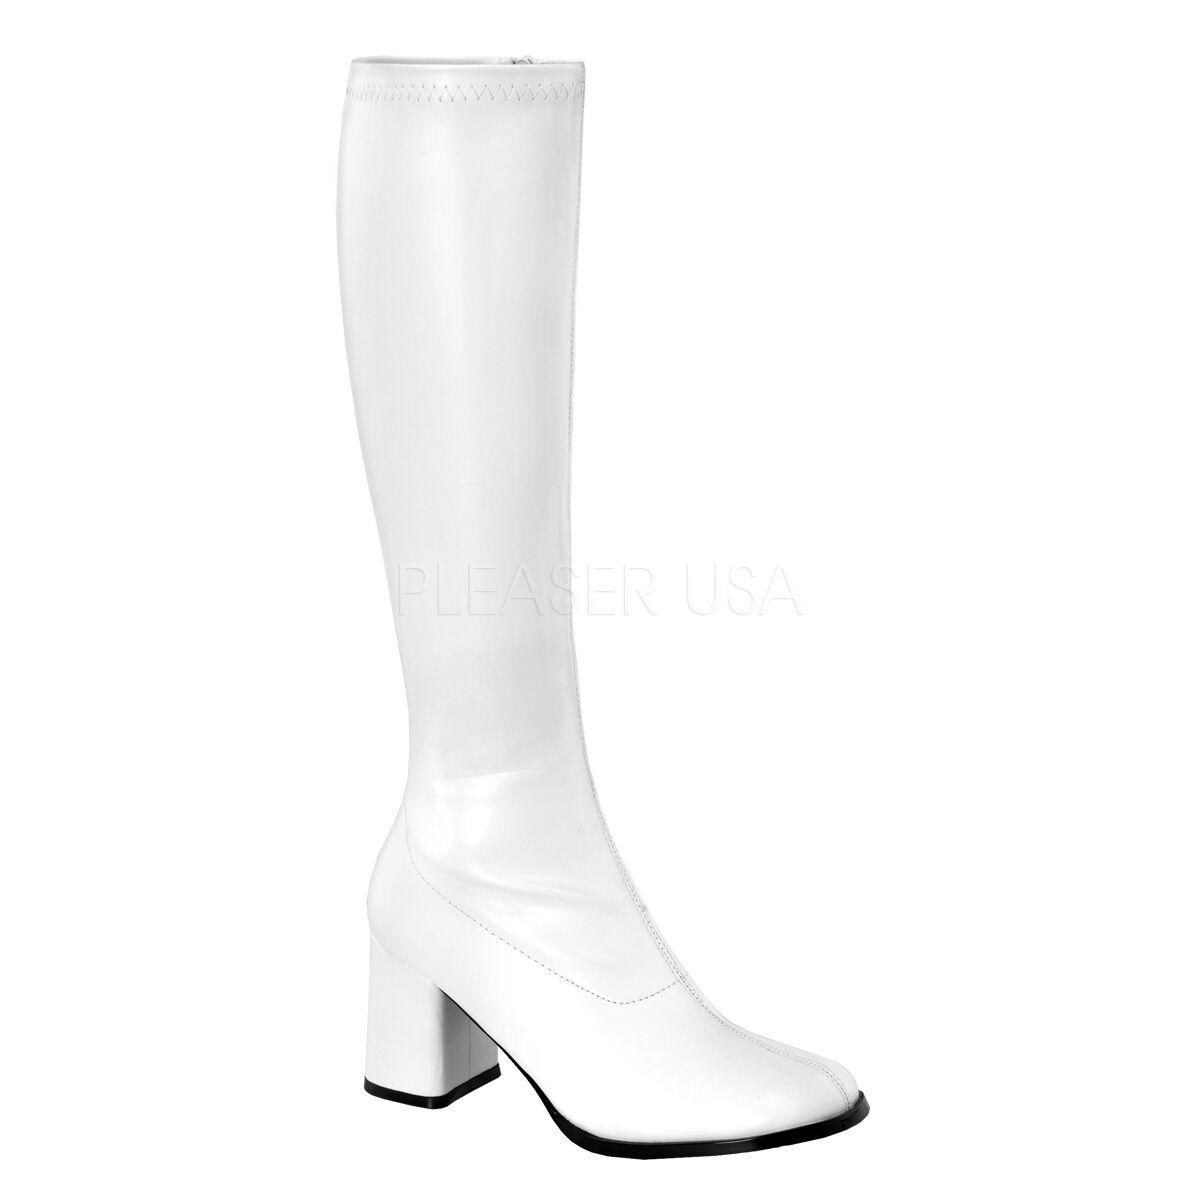 PLEASER FUNTASMA GOGO-300 blanc PU STRETCH 70'S DISCO KNEE HIGH bottes